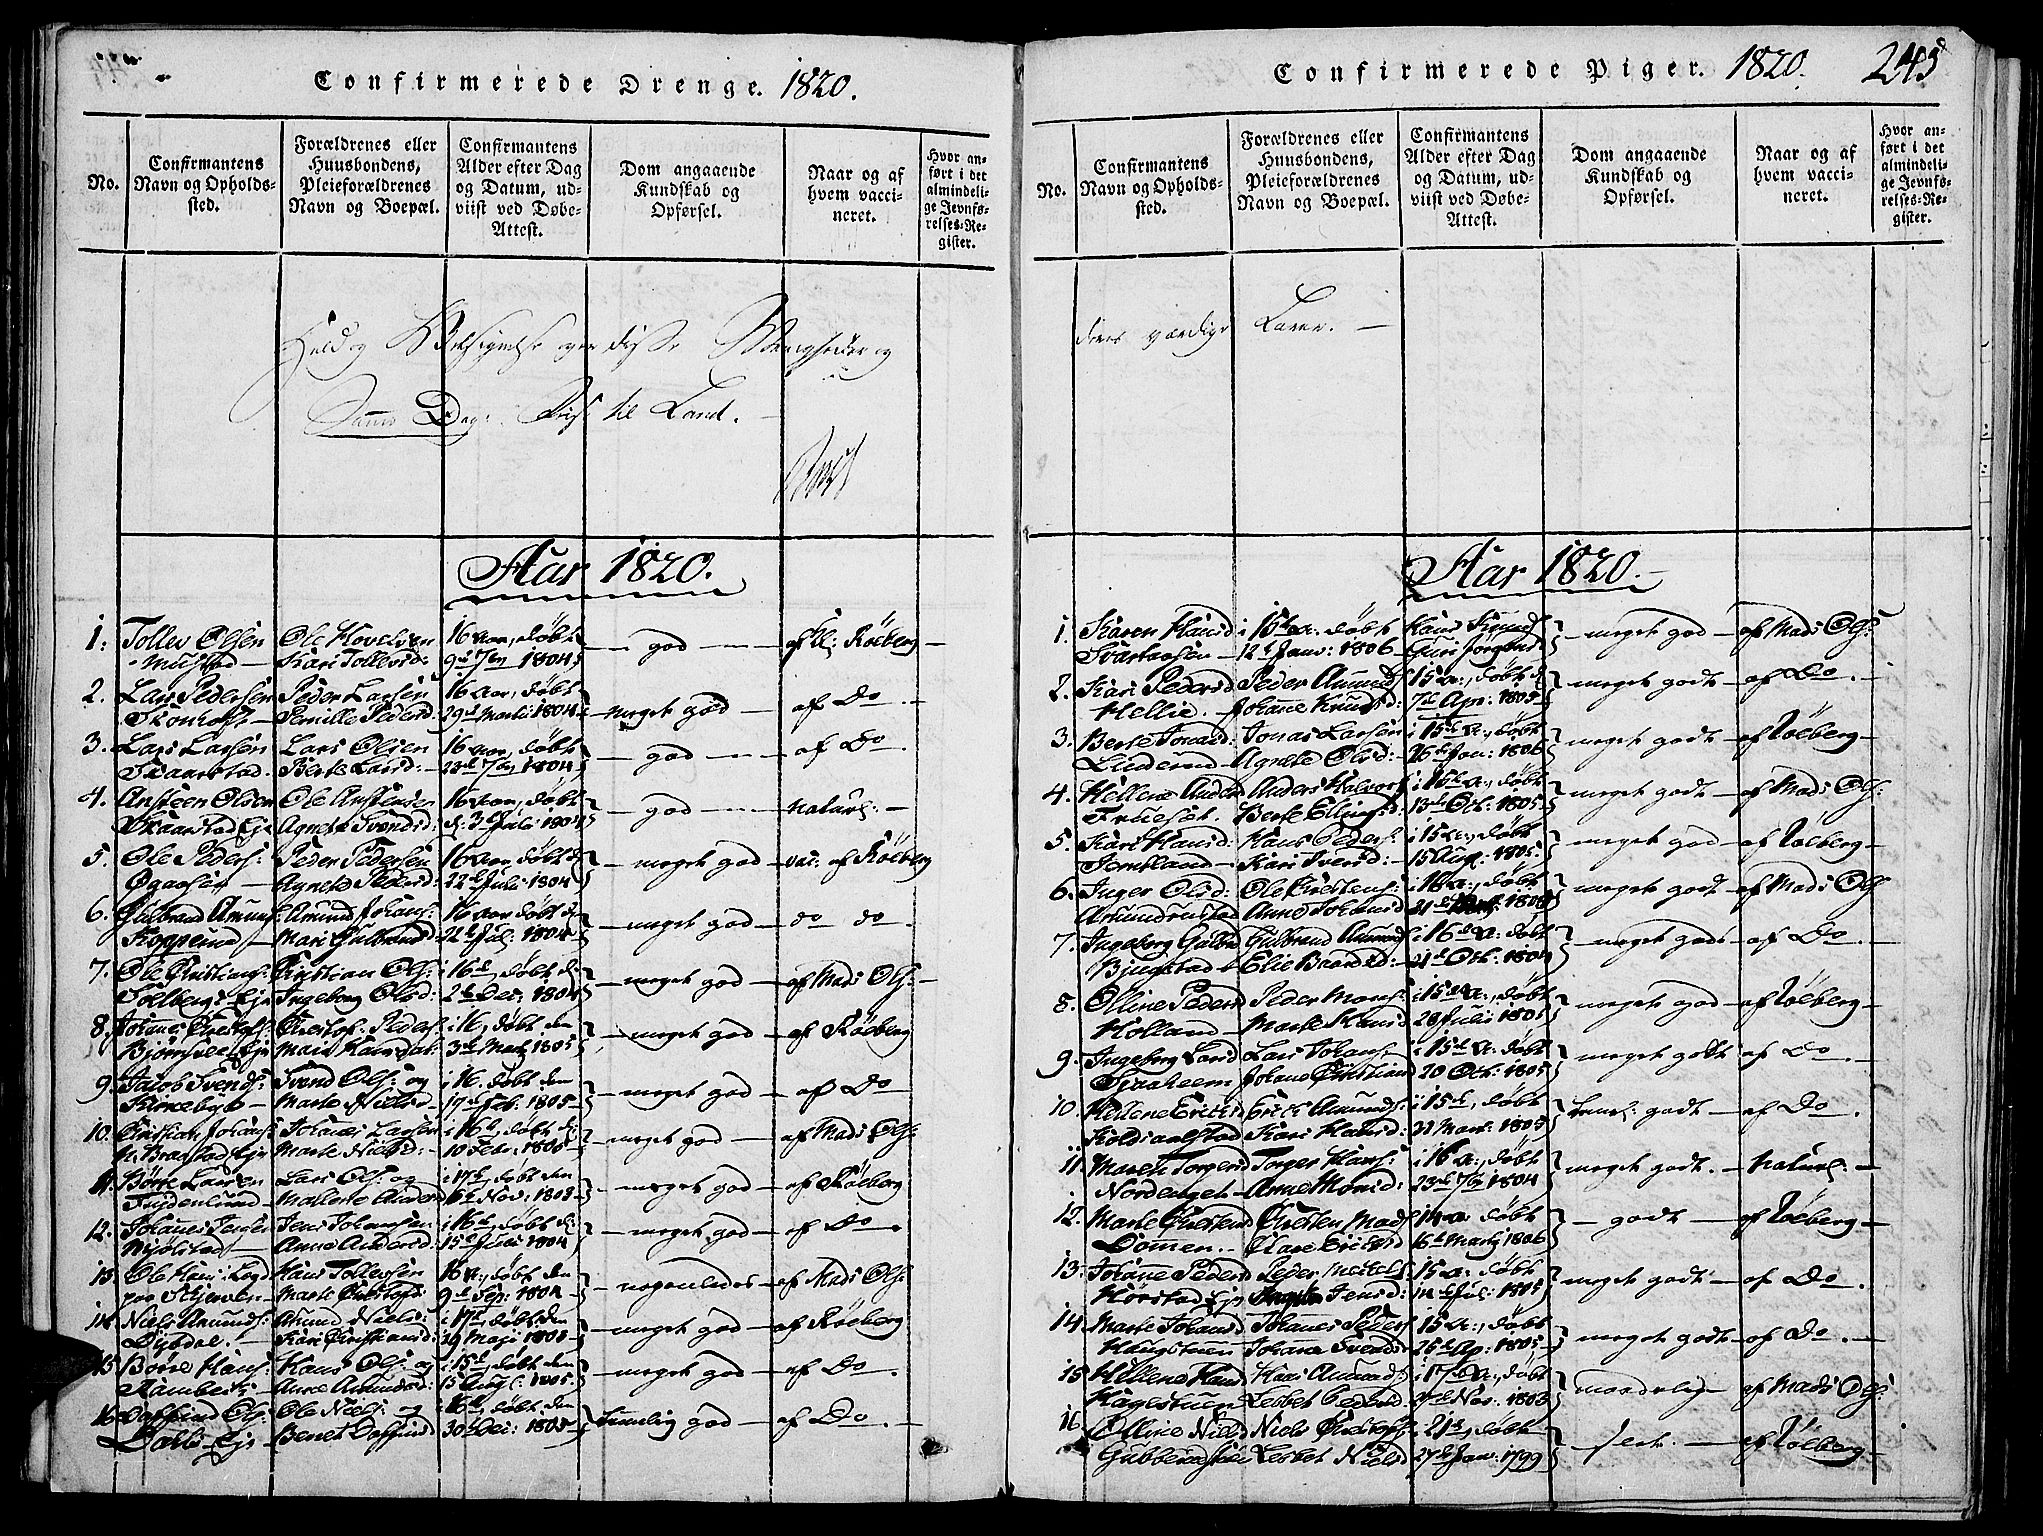 SAH, Vardal prestekontor, H/Ha/Haa/L0004: Ministerialbok nr. 4, 1814-1831, s. 245